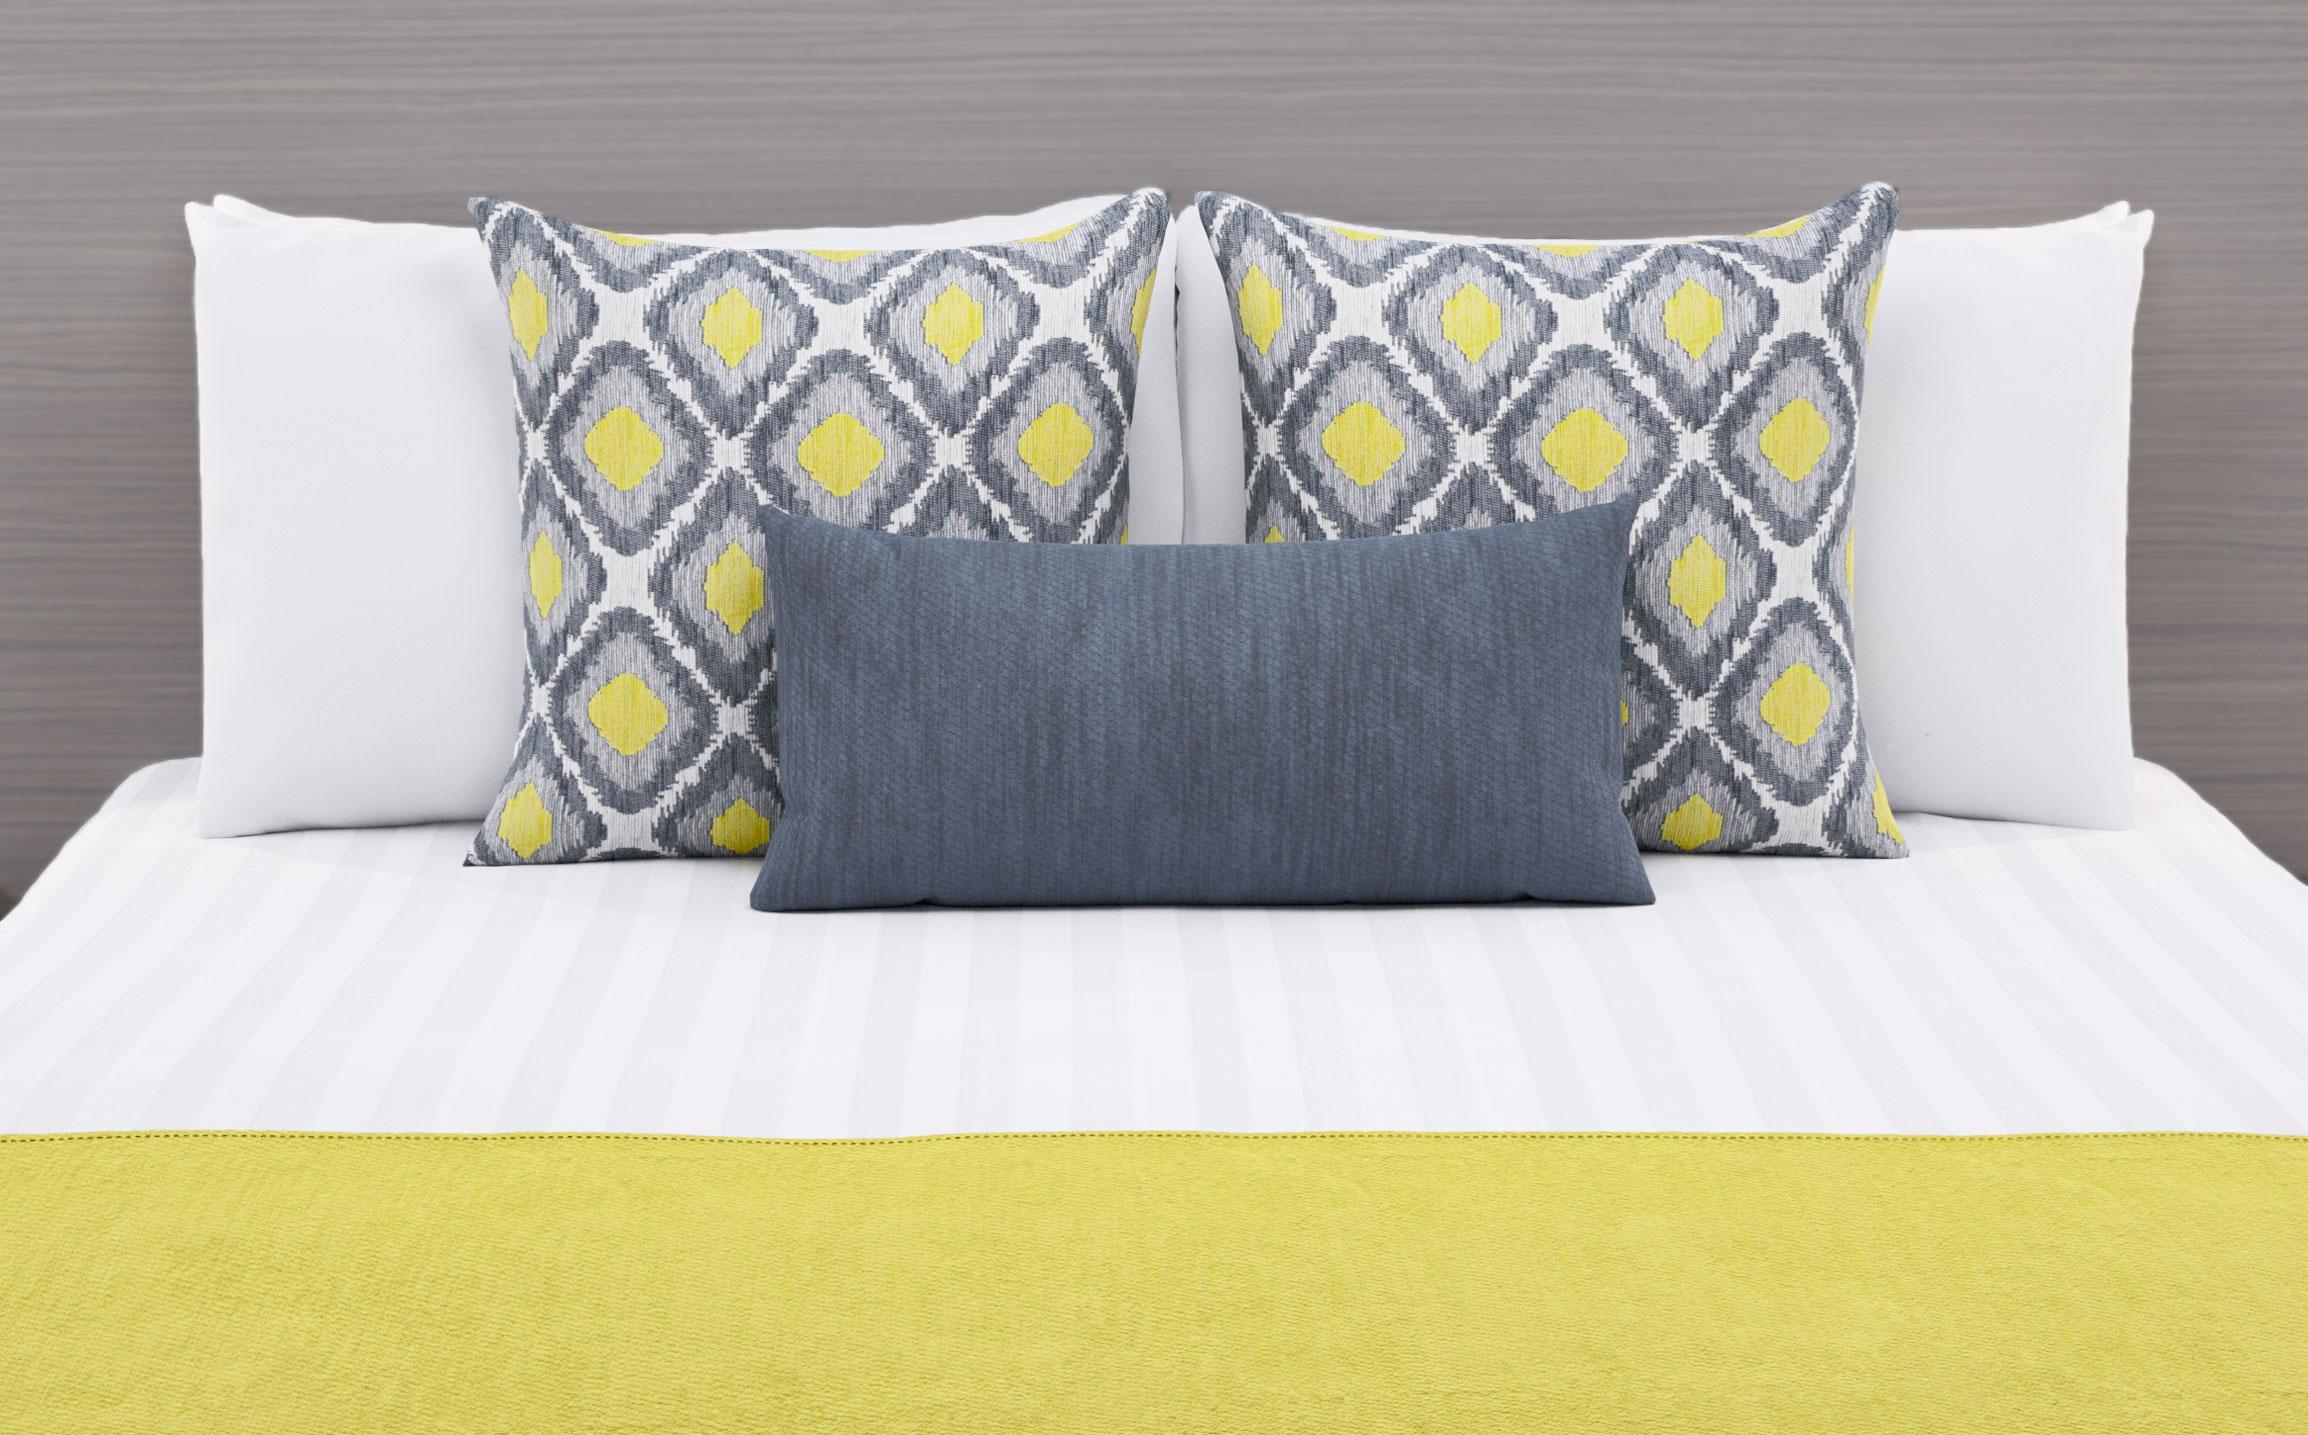 Ikat-Citrus-Grey-croped-yellow